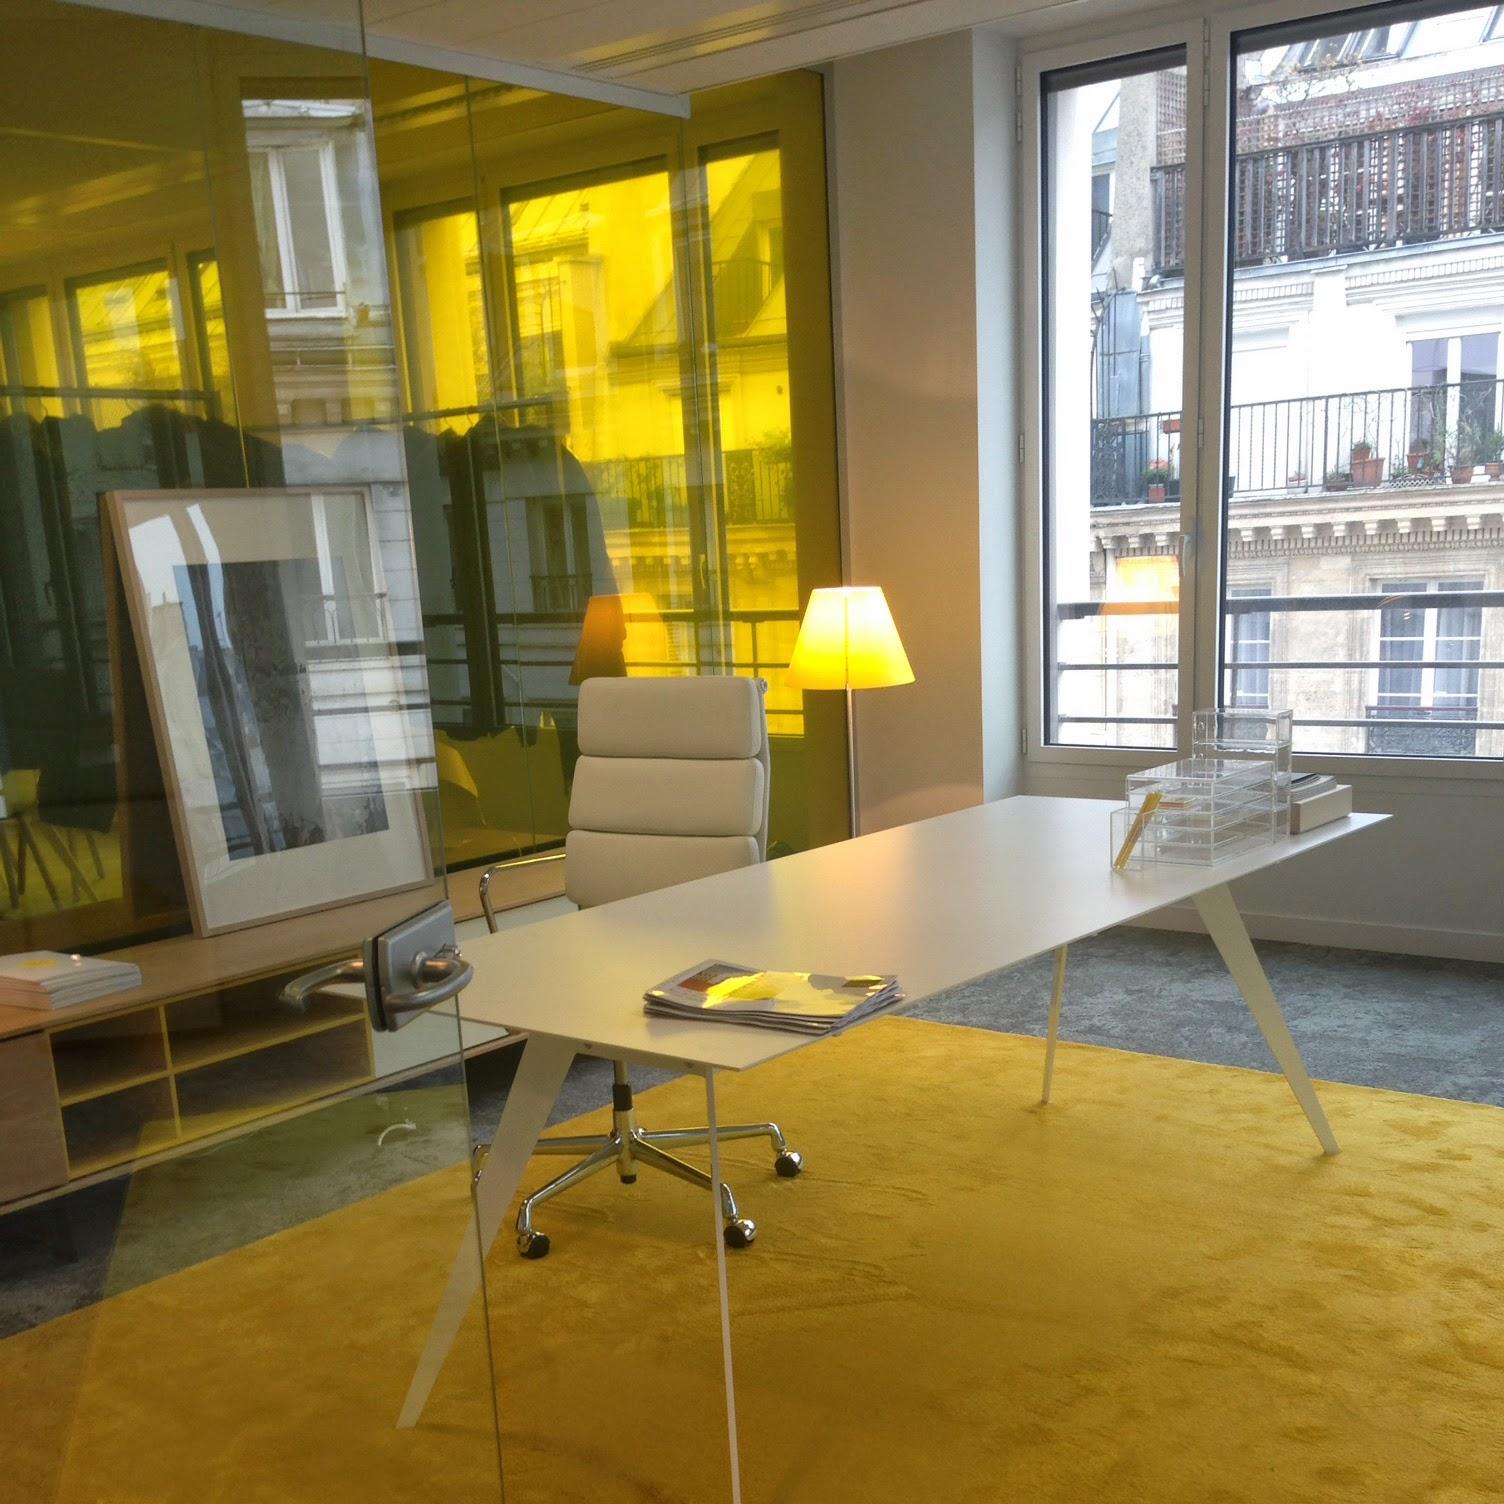 agence d 39 architecture int rieure parallel paris avril 2015. Black Bedroom Furniture Sets. Home Design Ideas